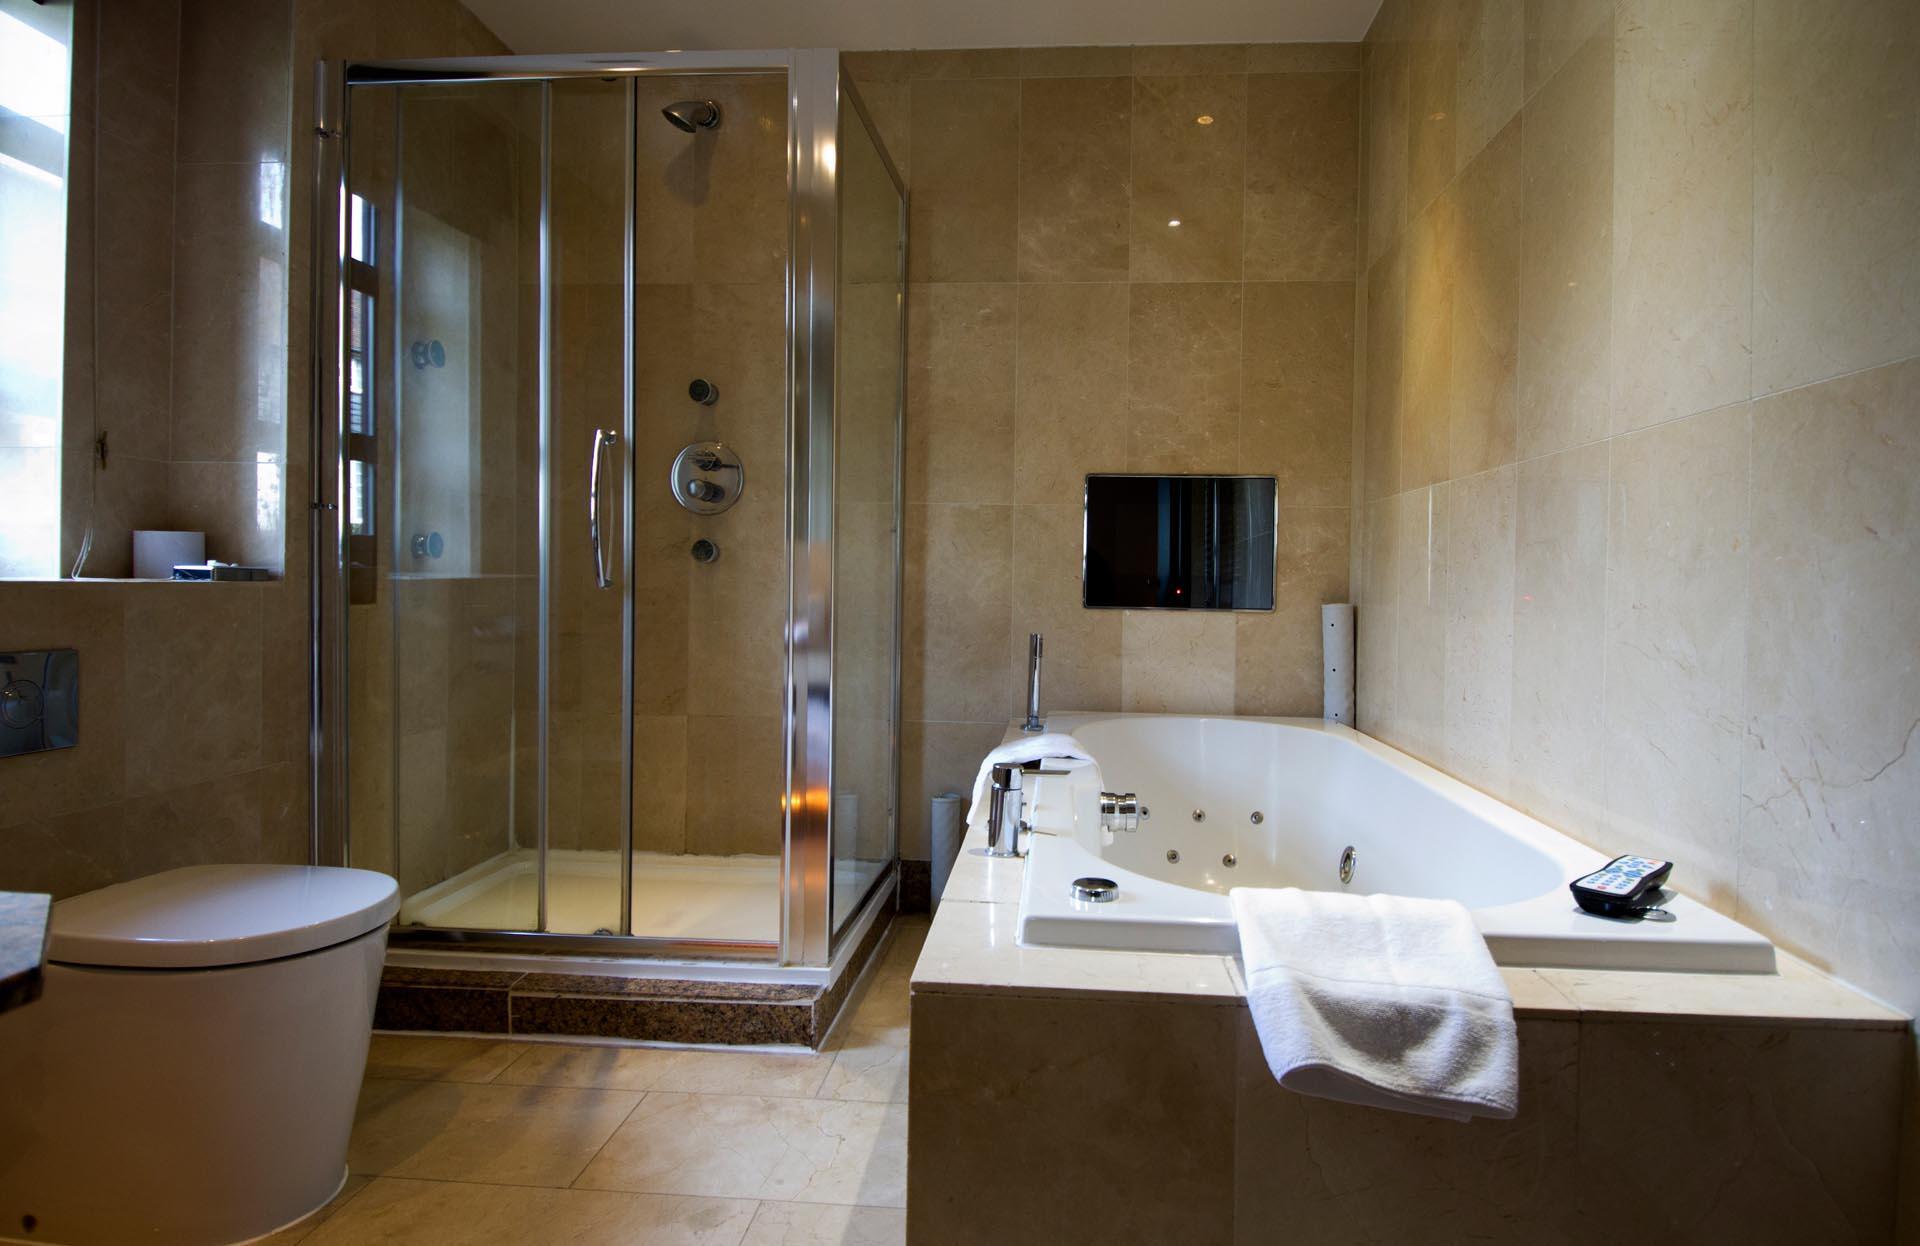 Executive Room Bath at Barn Hotel Ruislip near London